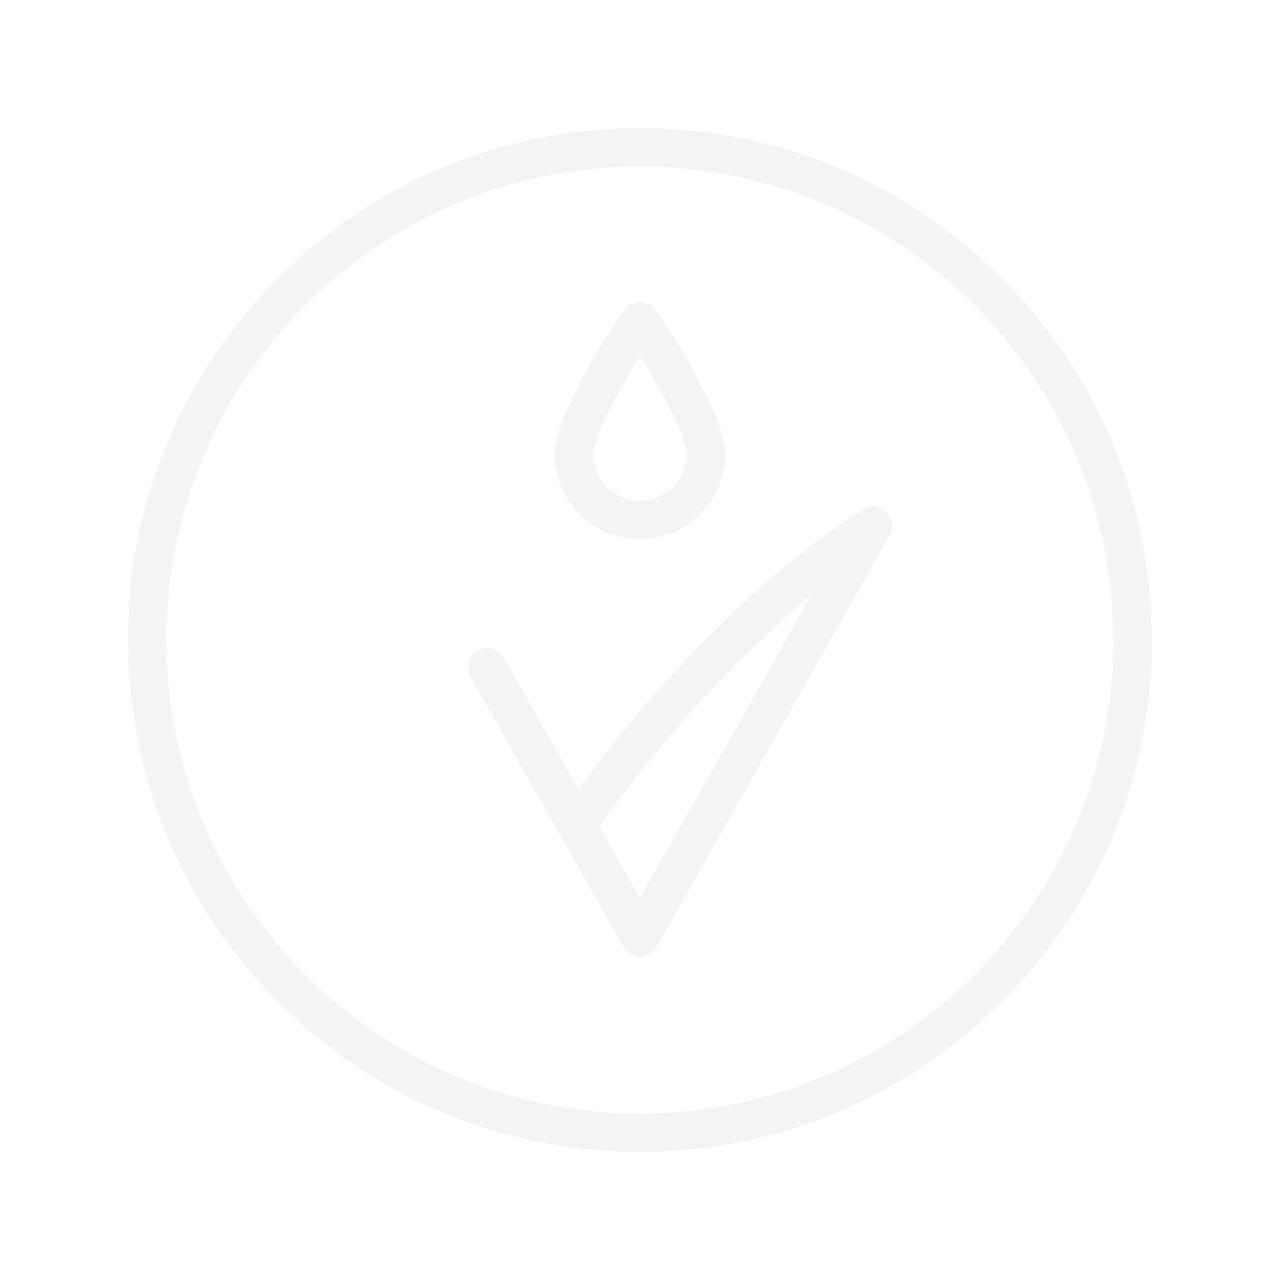 EYLURE Superfix Adhesive 6ml